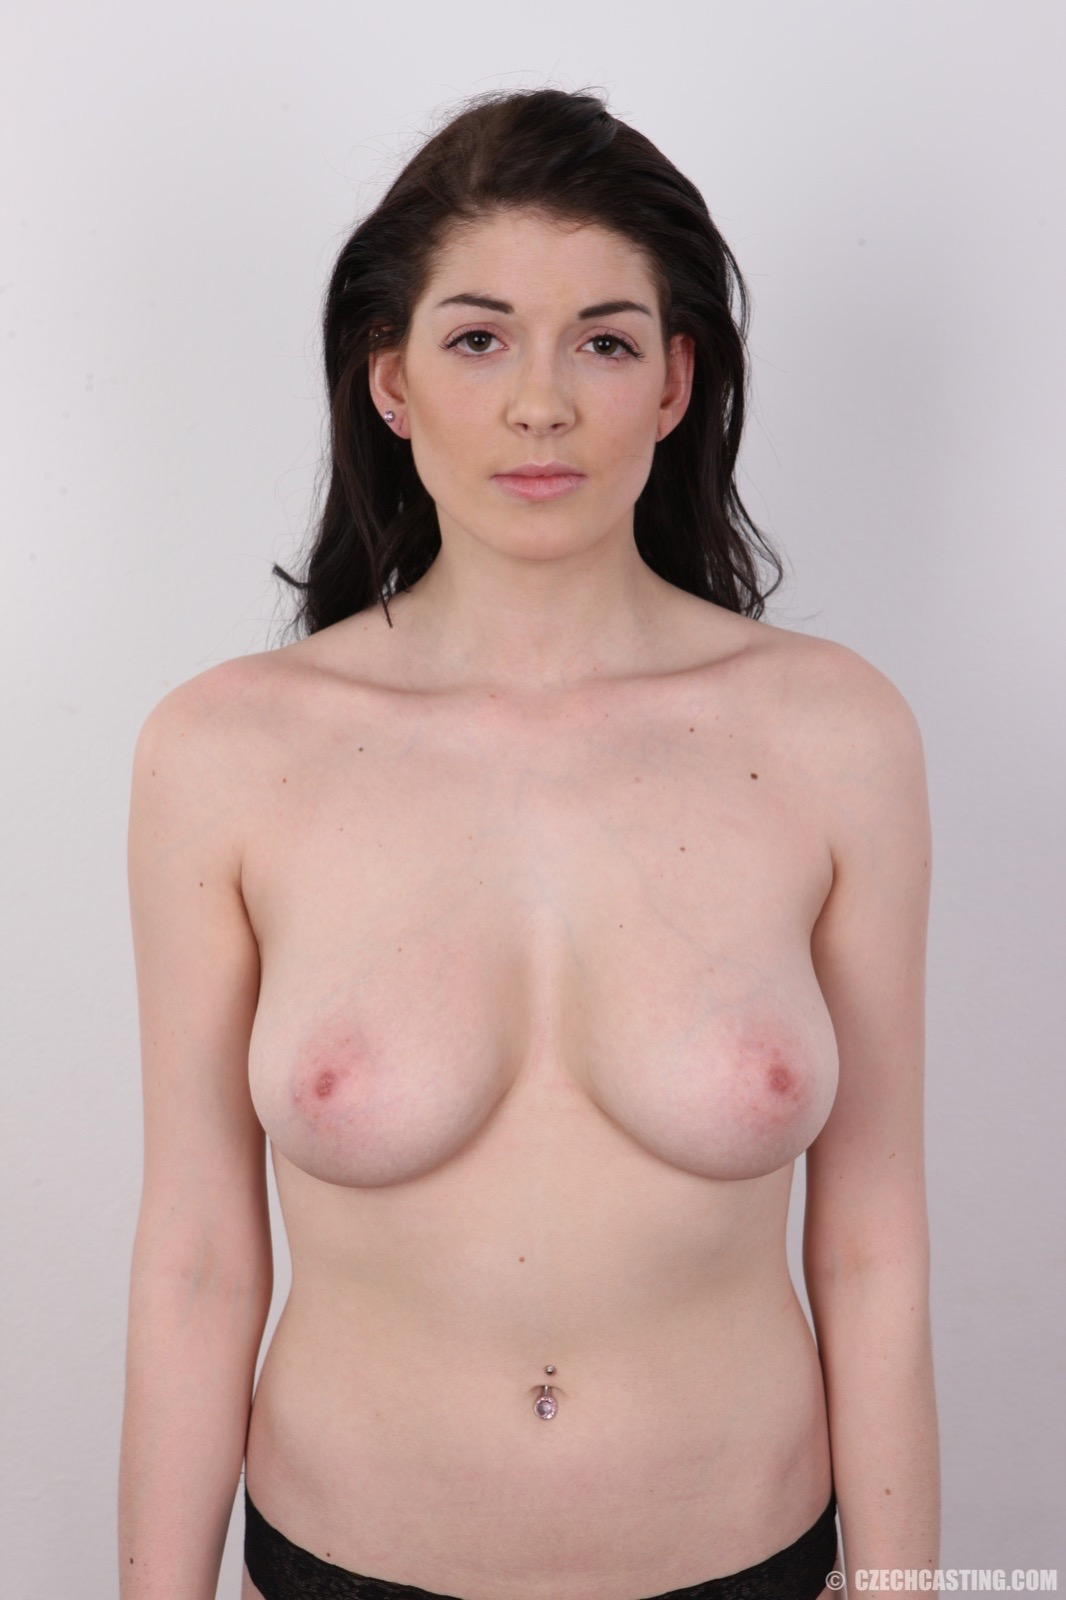 Czech casting nude girls